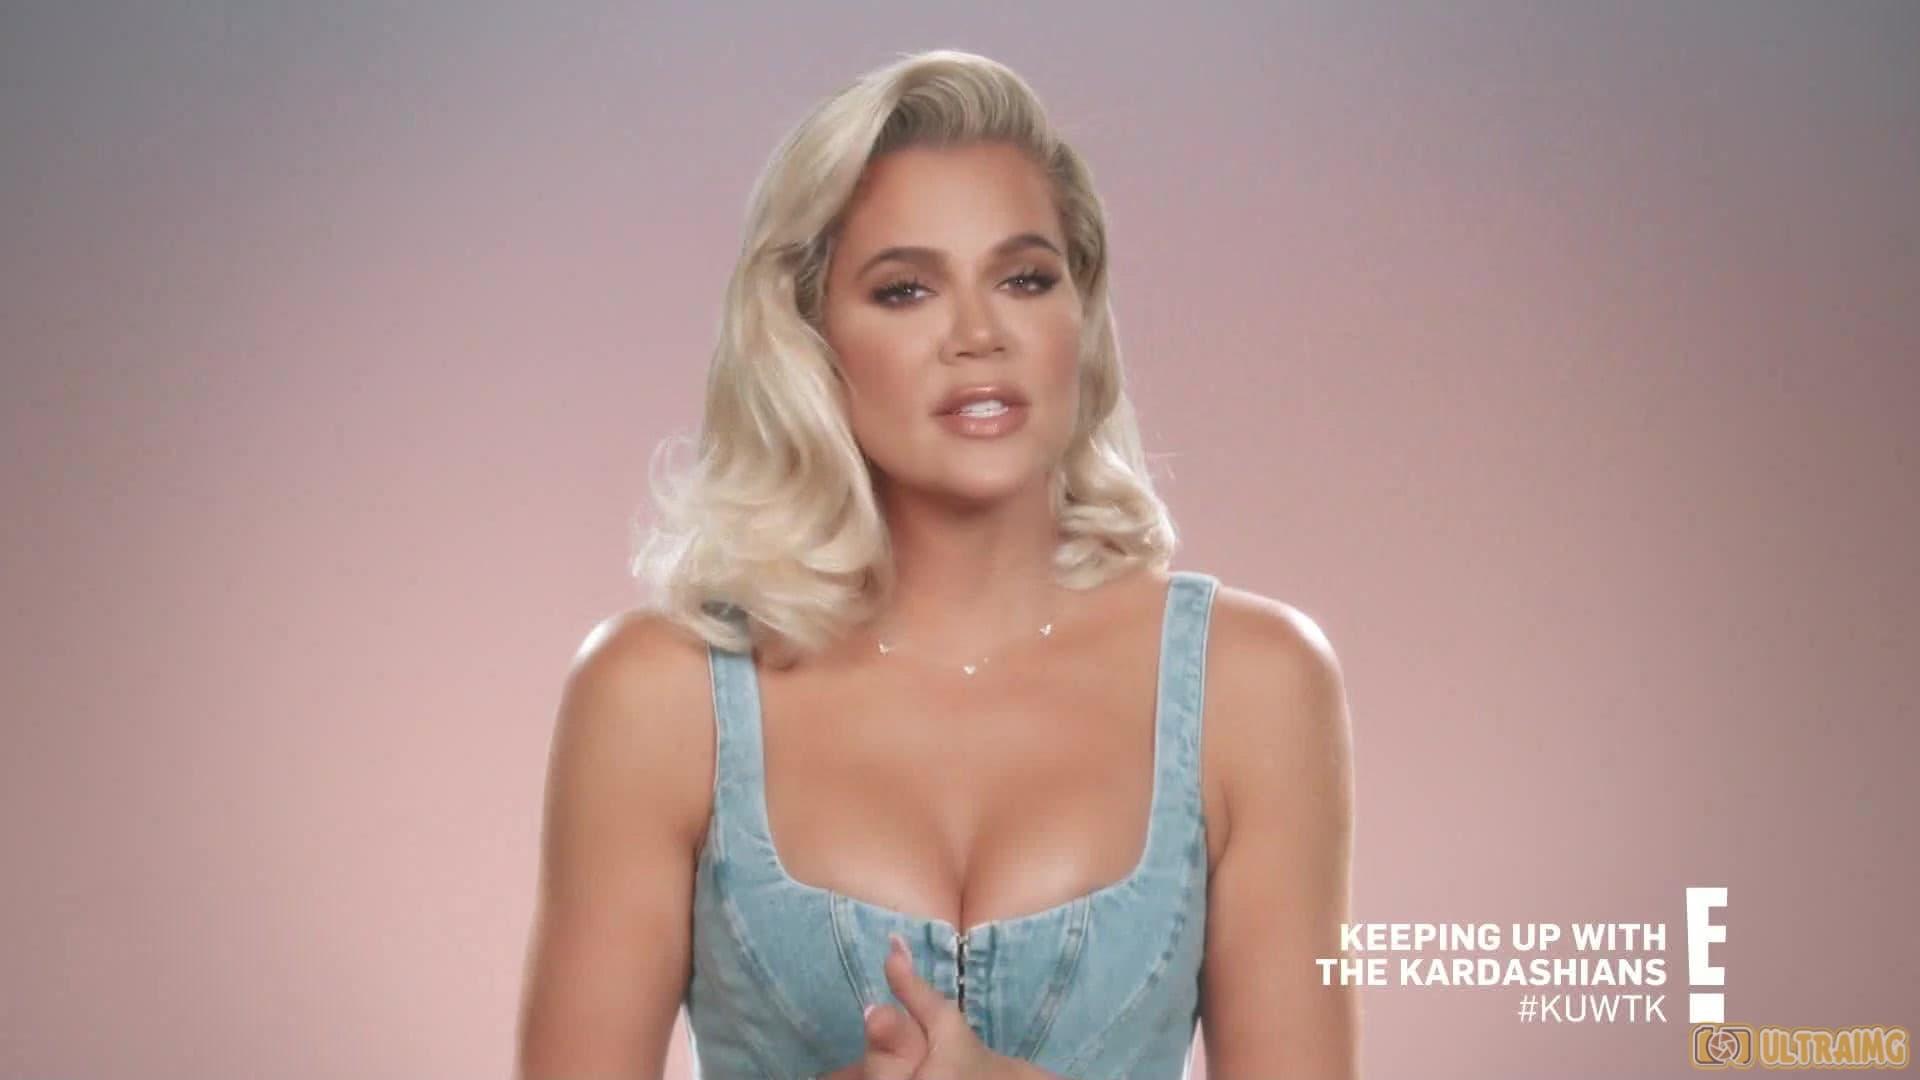 Keeping Up with the Kardashians - Season 17 Episode 9 : Hard Candy